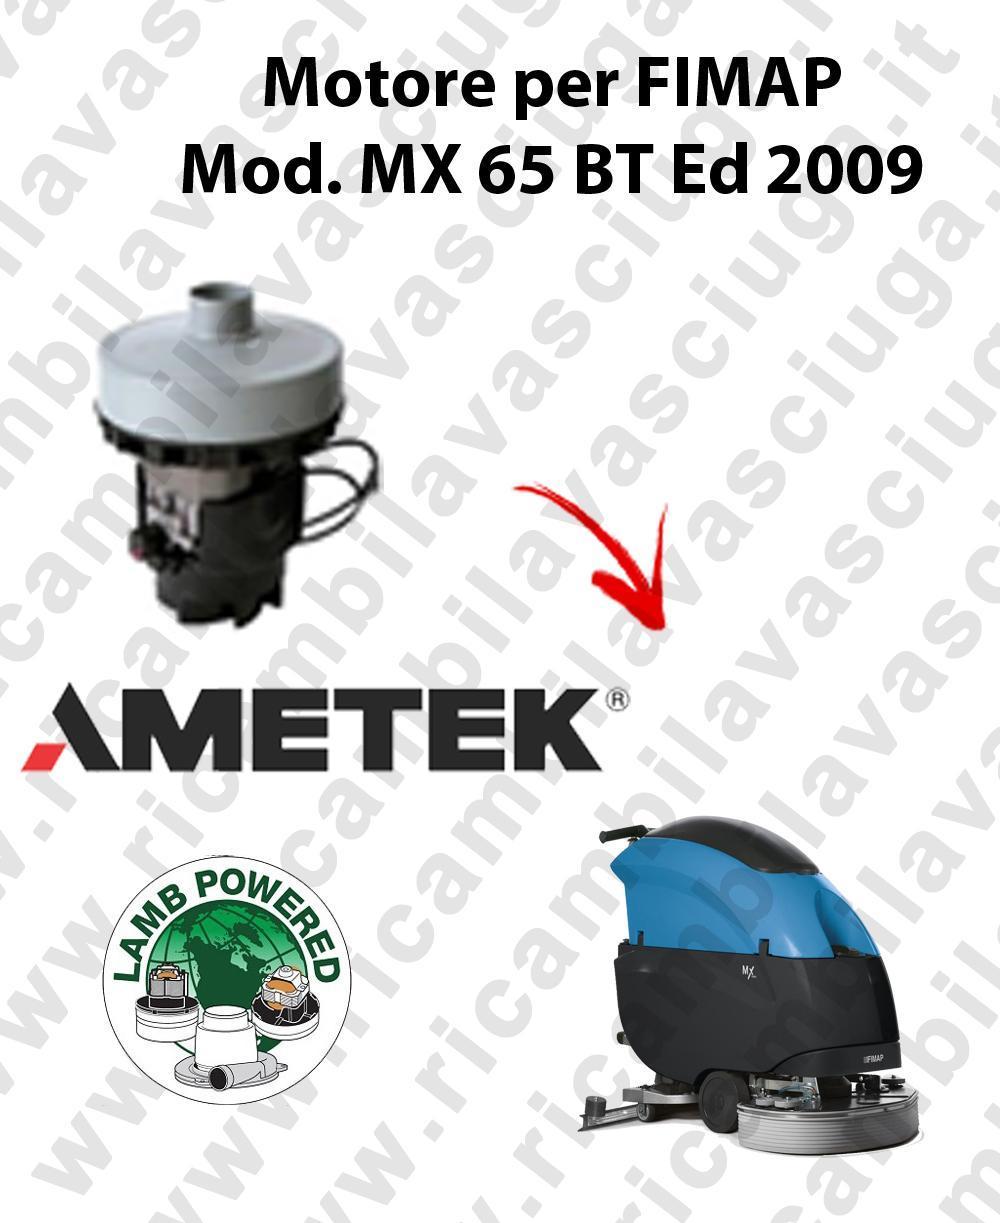 MX 65 BT Ed. 2009 Vacuum motor LAMB AMETEK scrubber dryer FIMAP